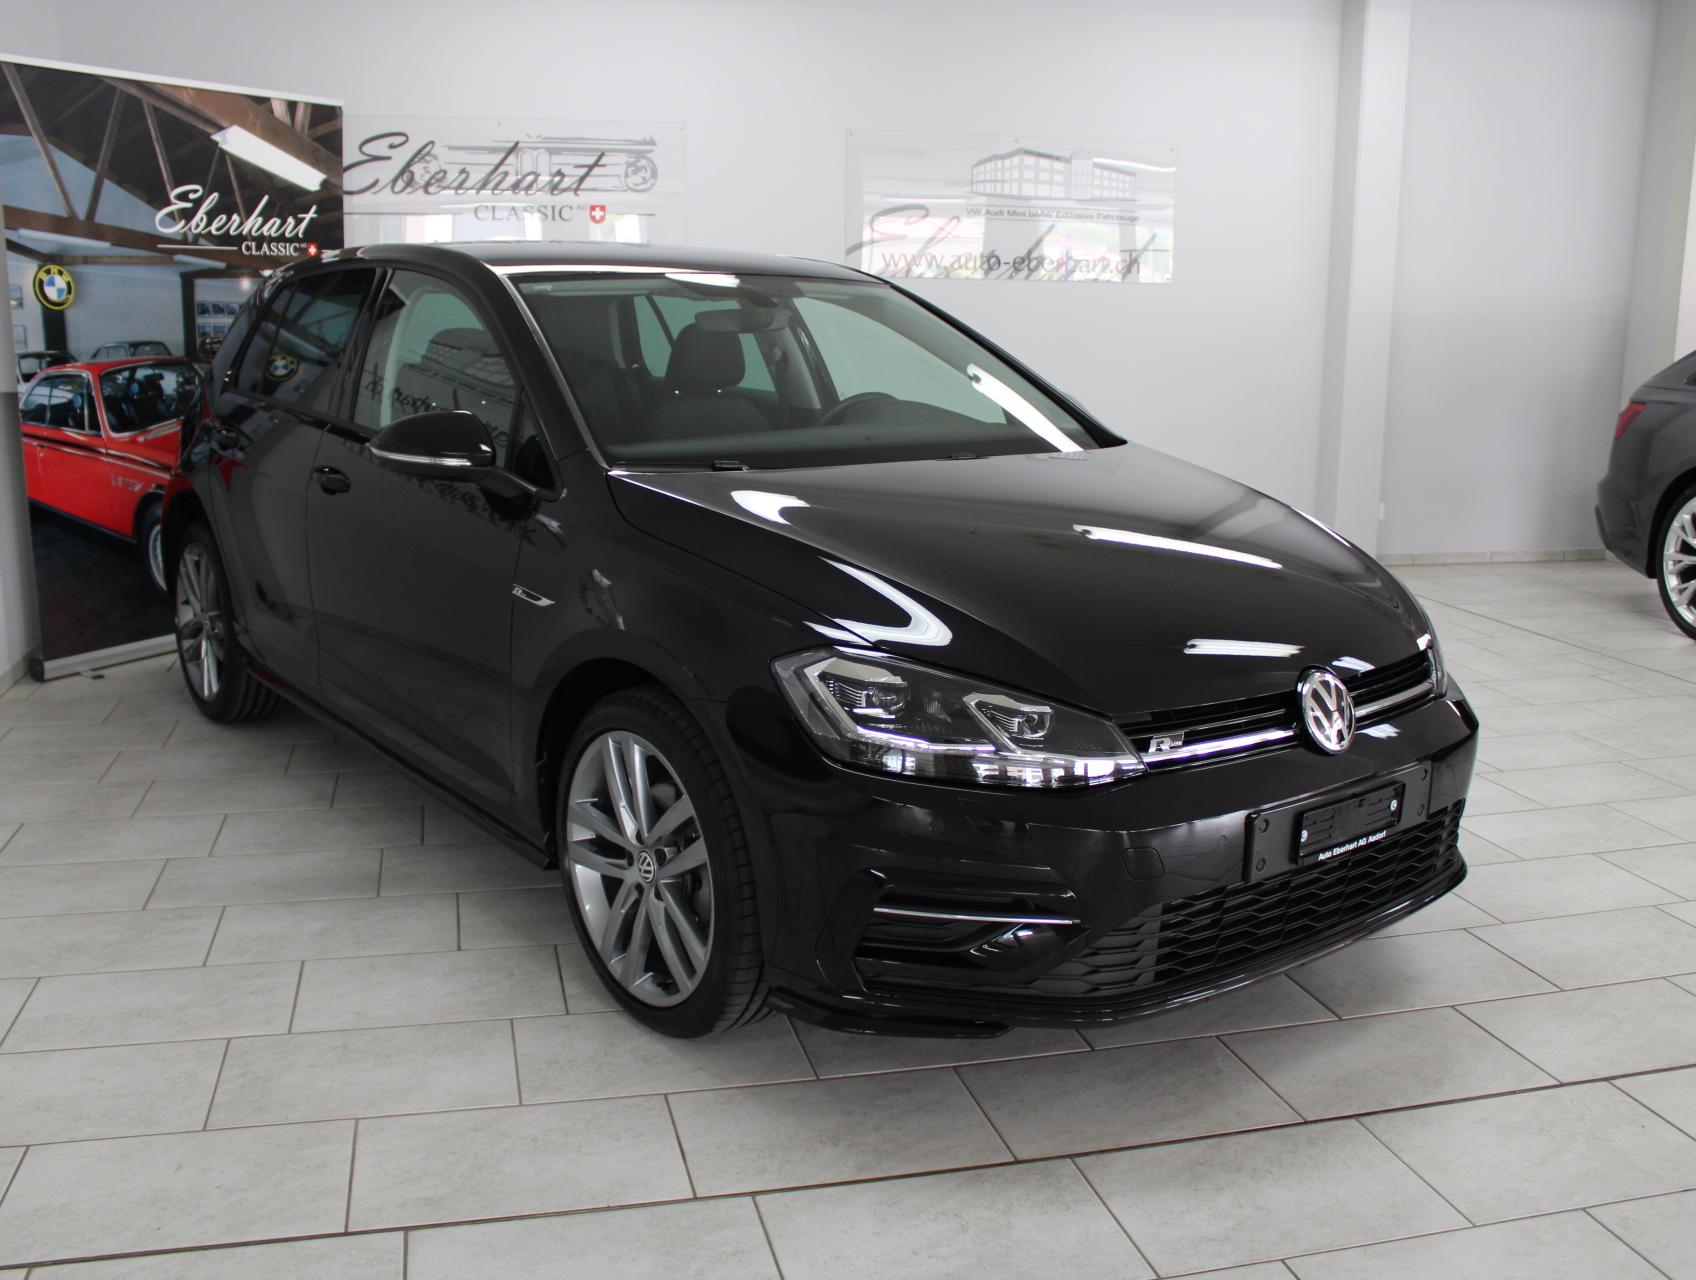 saloon VW Golf 2.0 TDI 4m